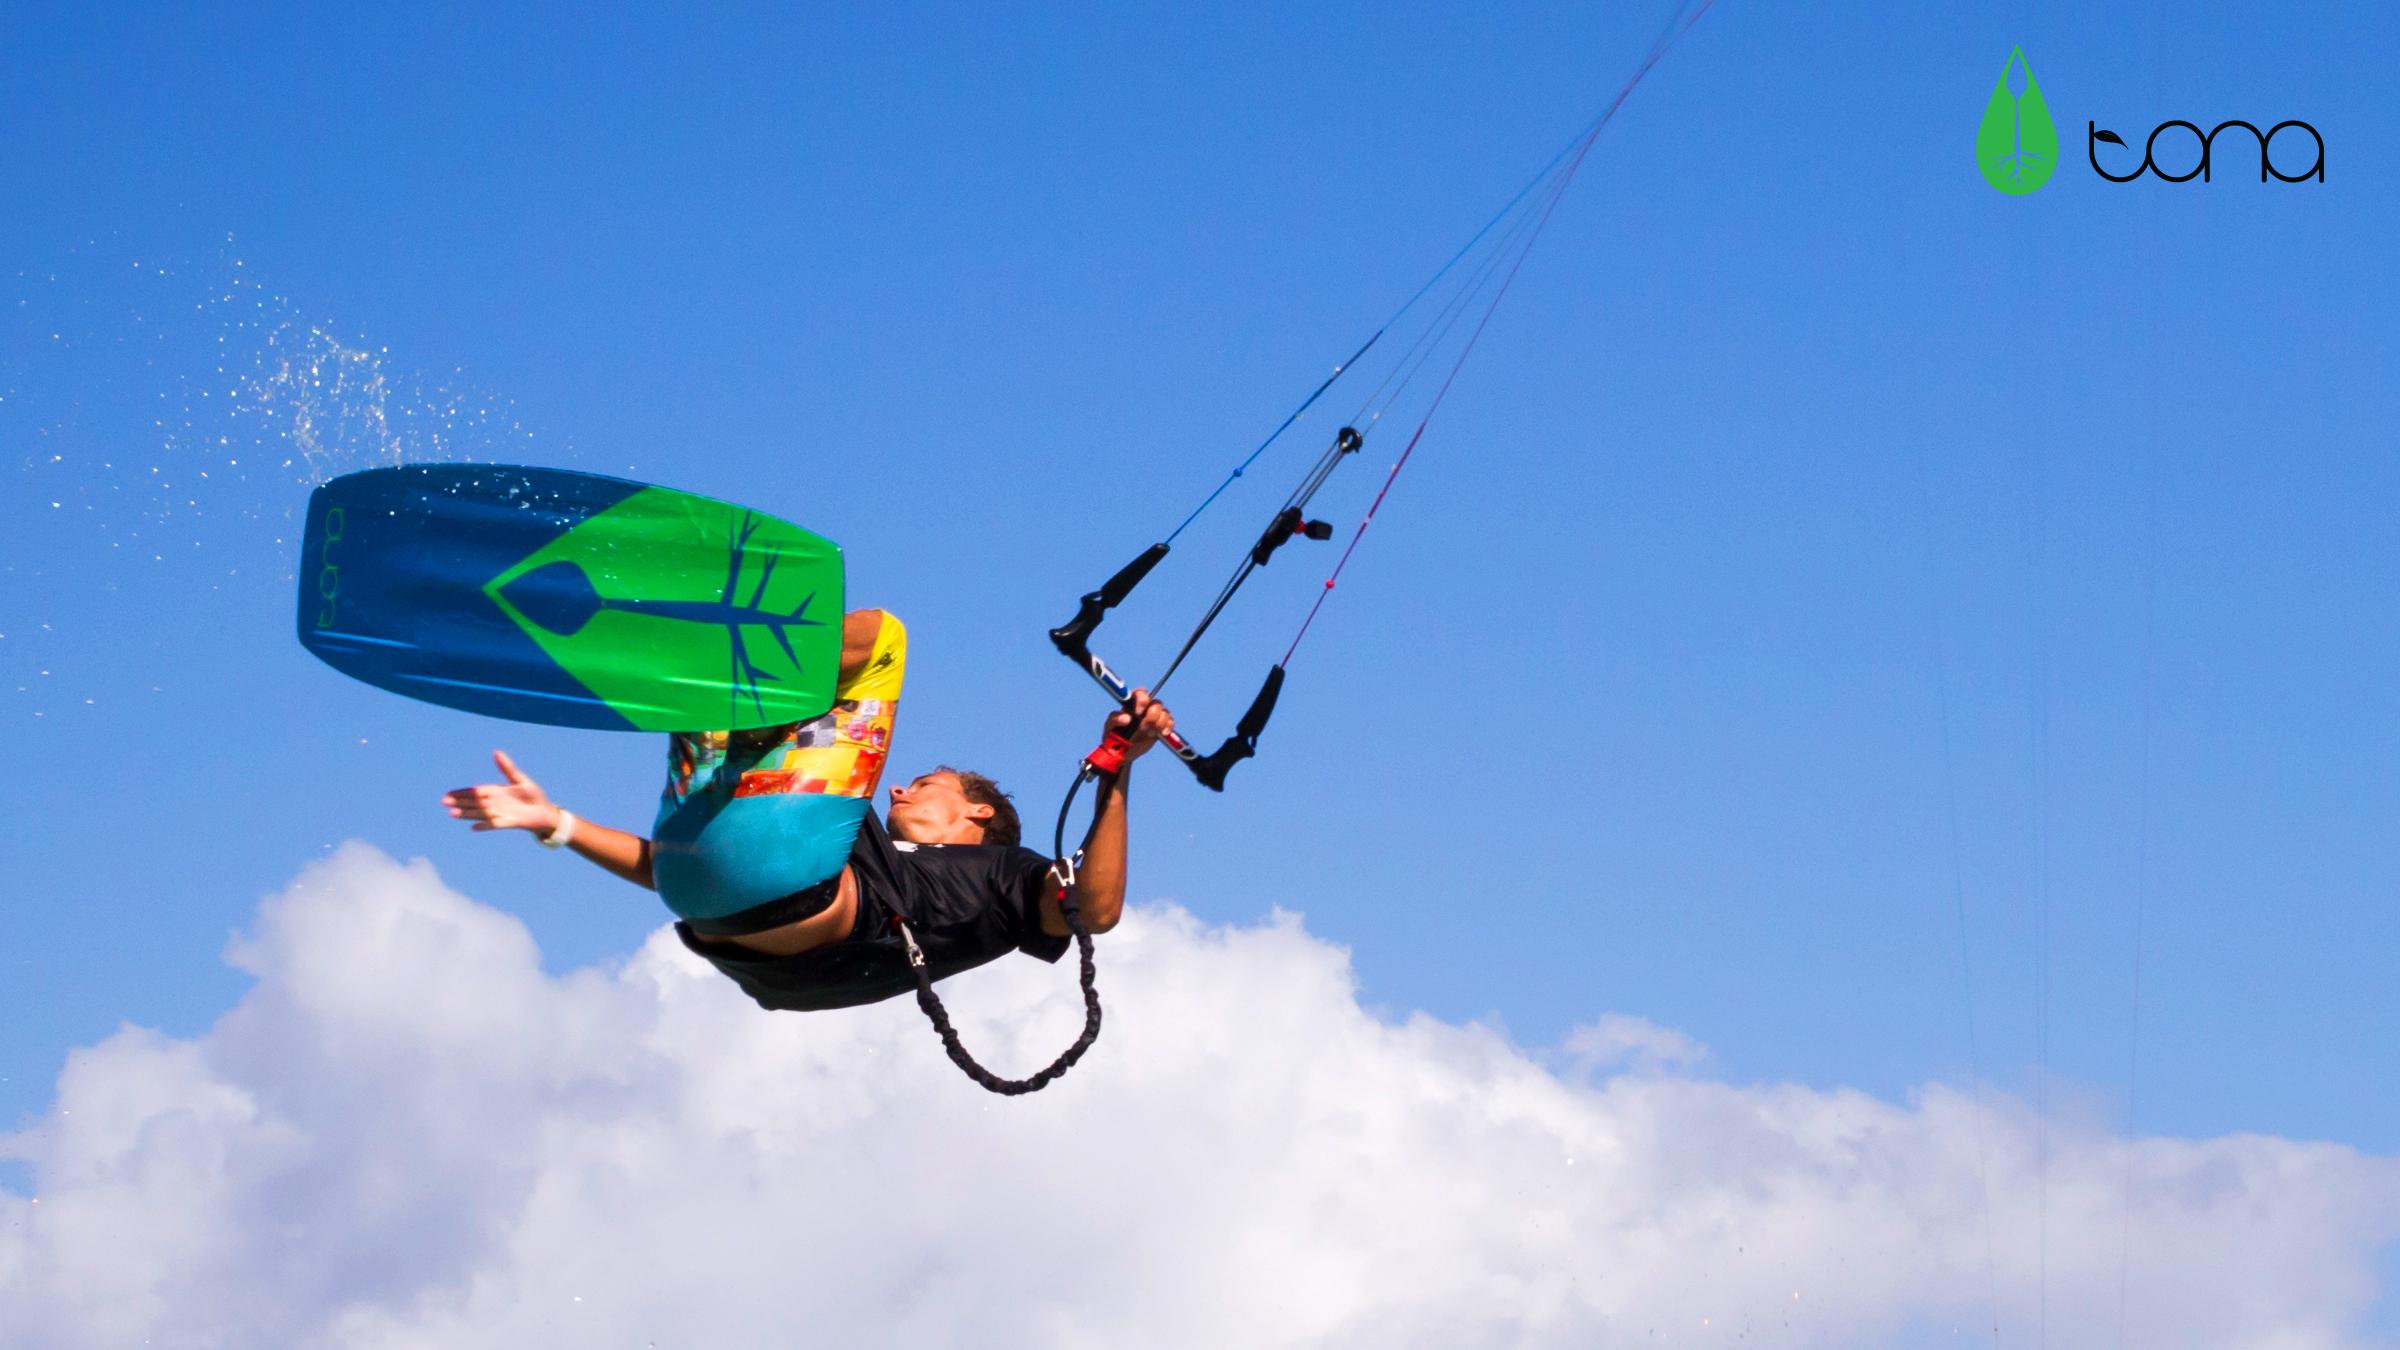 kitesurf wallpaper image - Jake Kelsick on the Tona Pop board handlepassing awefully close a C4 Ozone kite - in resolution: High Definition - HD 16:9 2400 X 1350